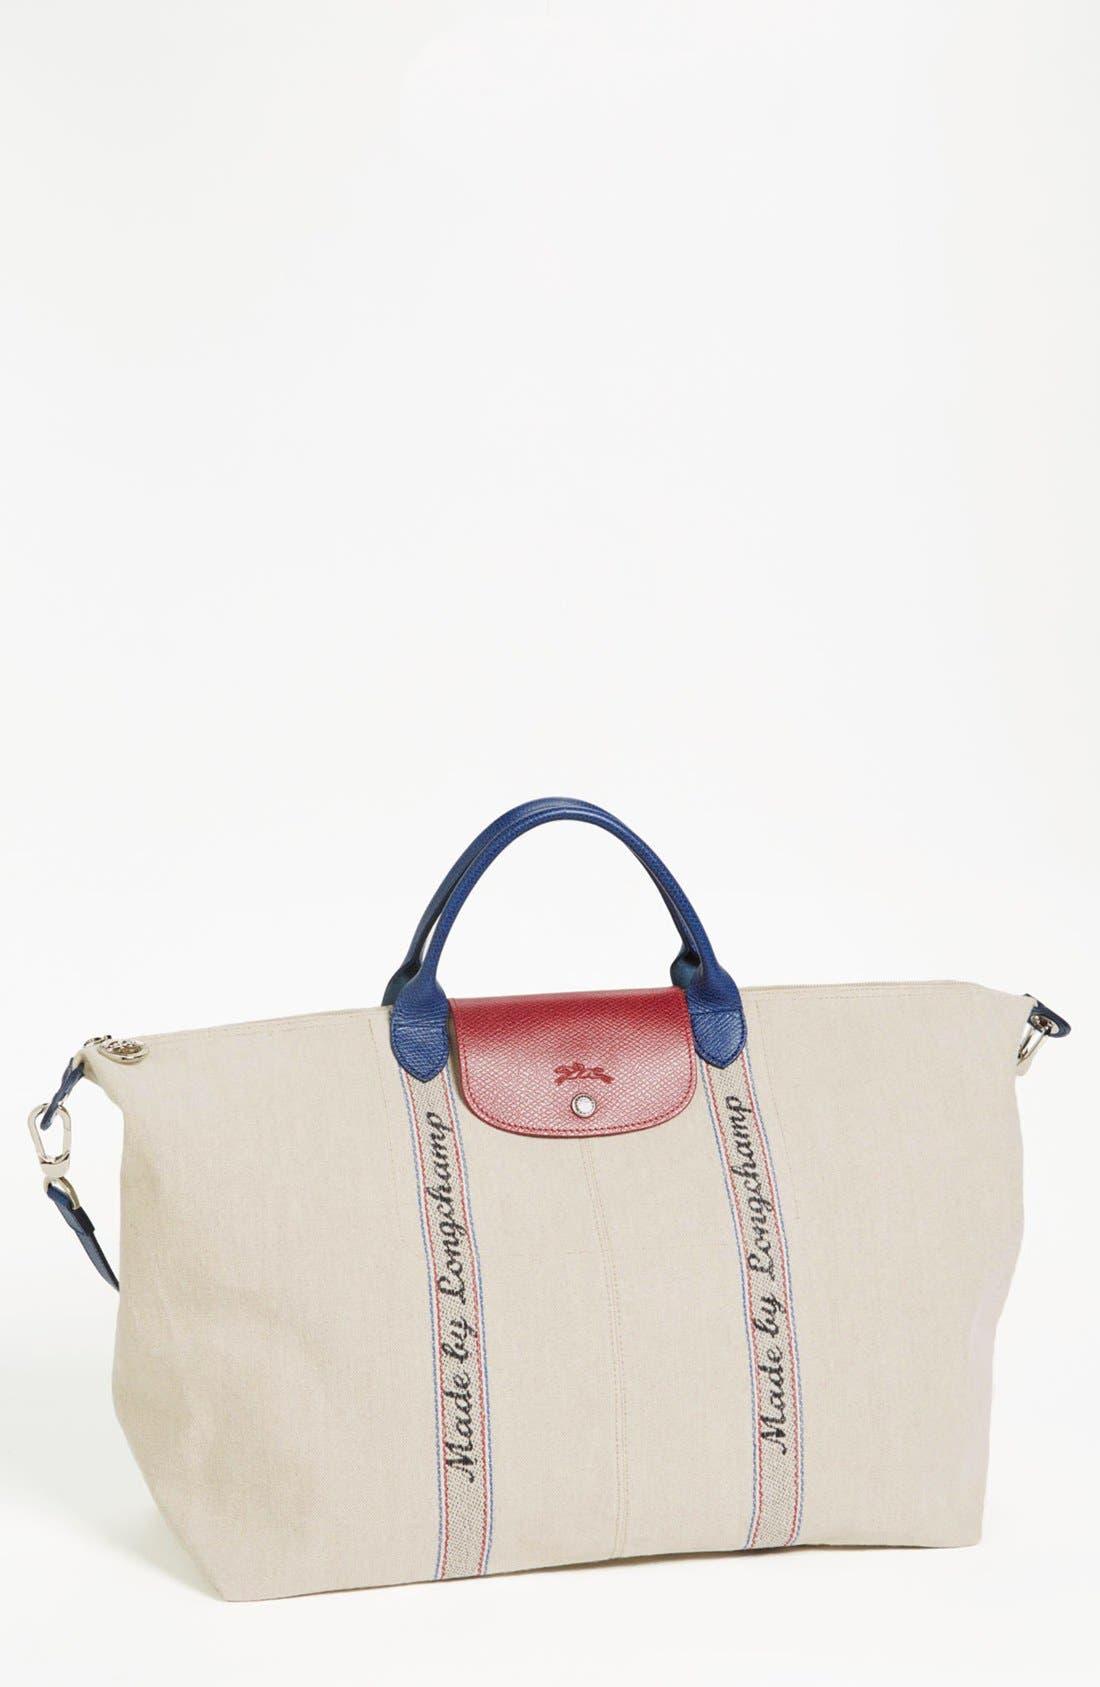 Main Image - Longchamp 'Made by Longchamp' Travel Tote